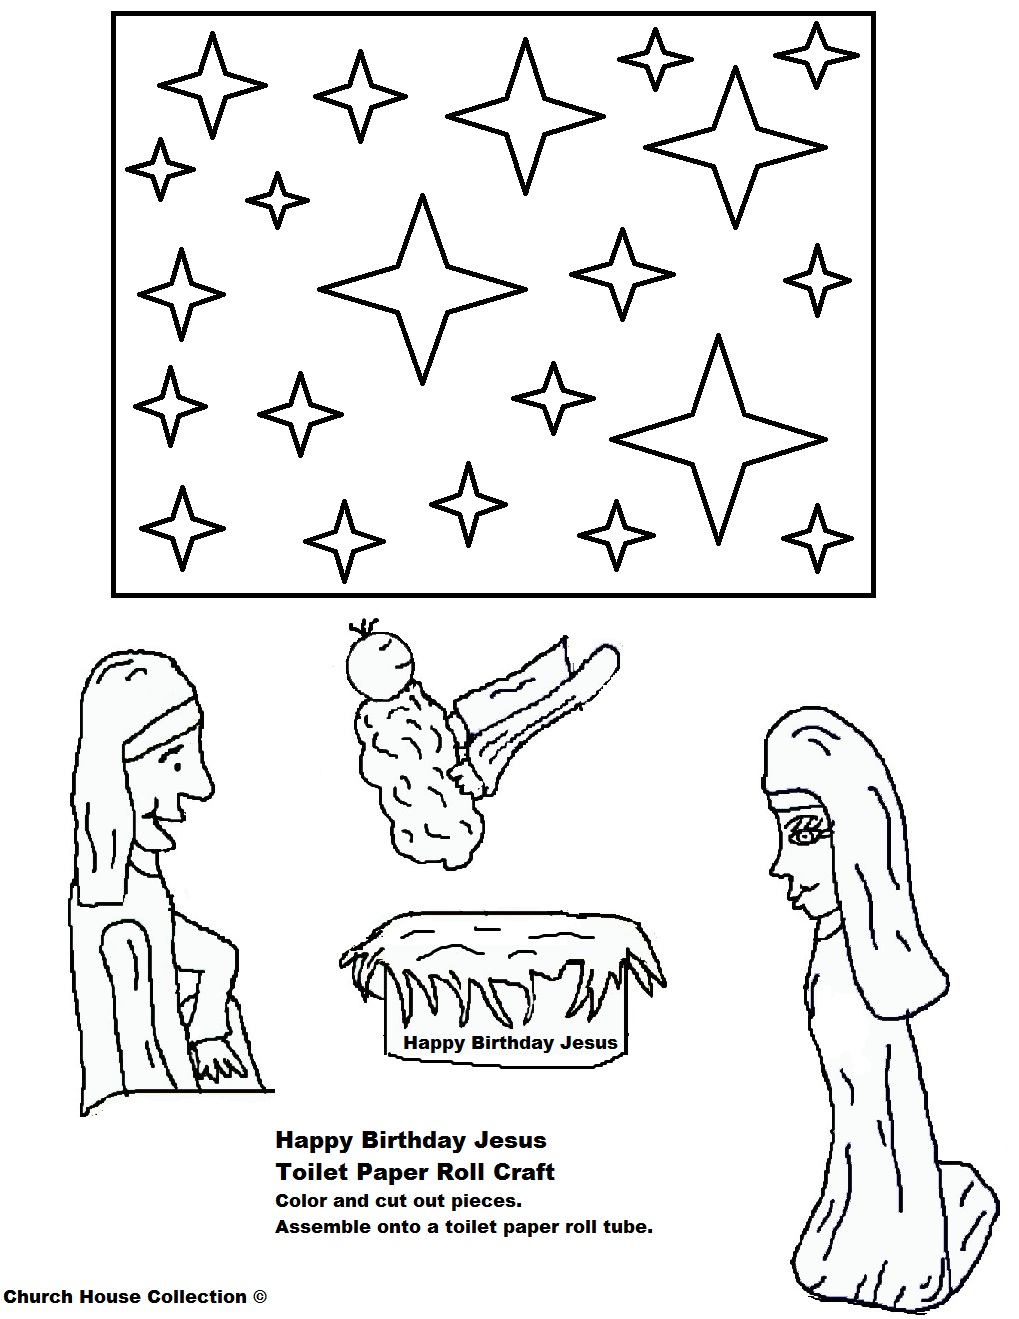 Church House Collection Blog: Happy Birthday Jesus